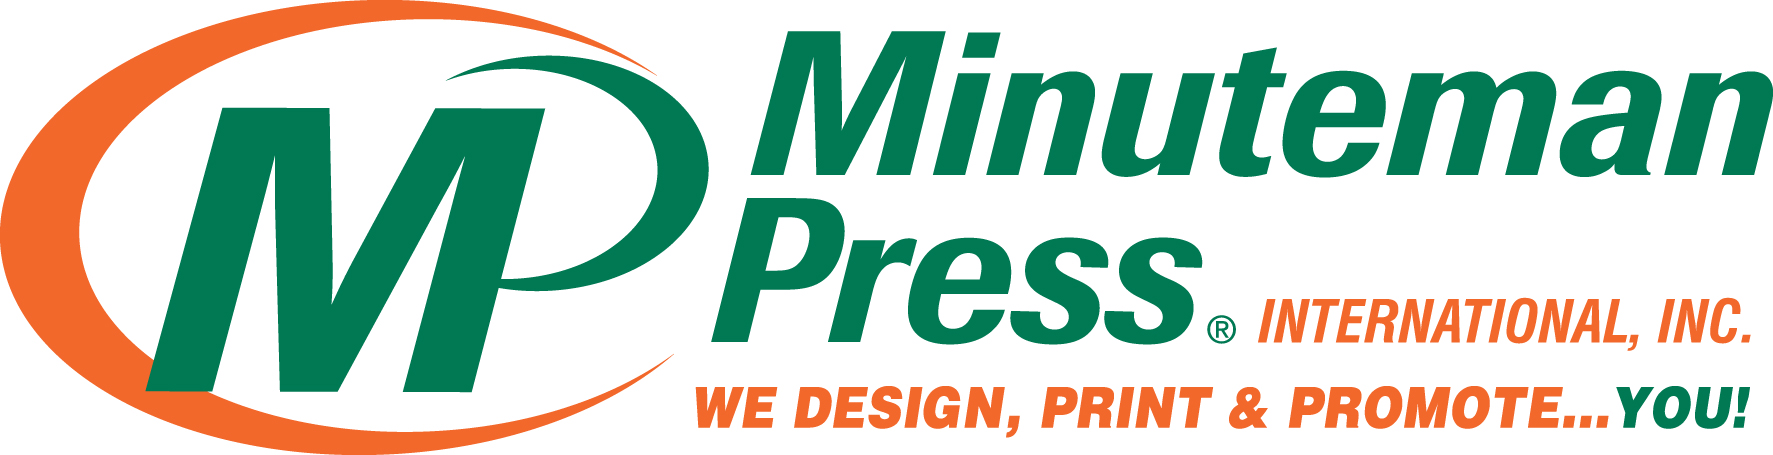 Minuteman Press International Inc